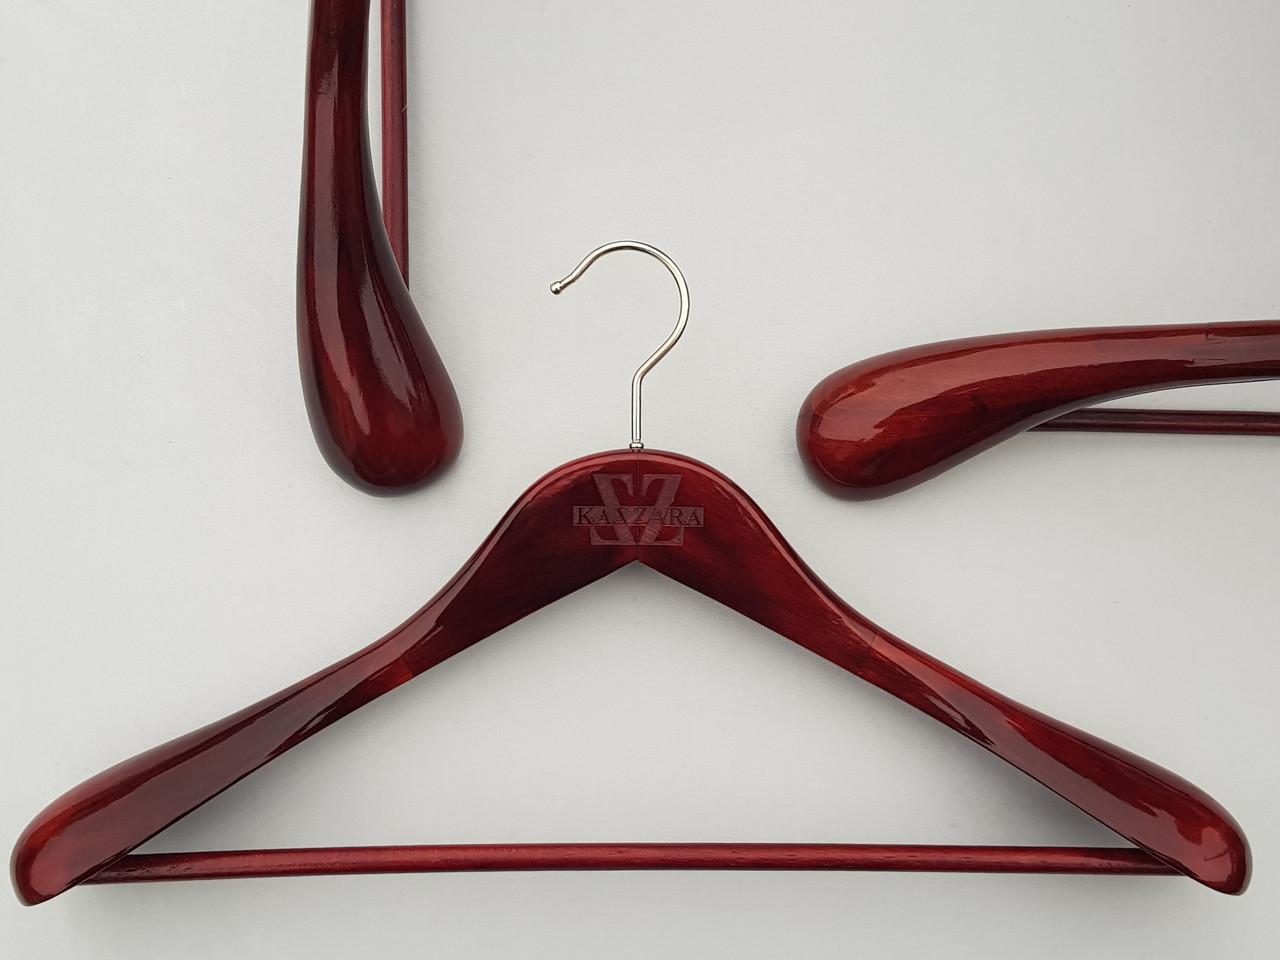 Плечики Mainetti Royal  цвета махагон,  длина 45 см